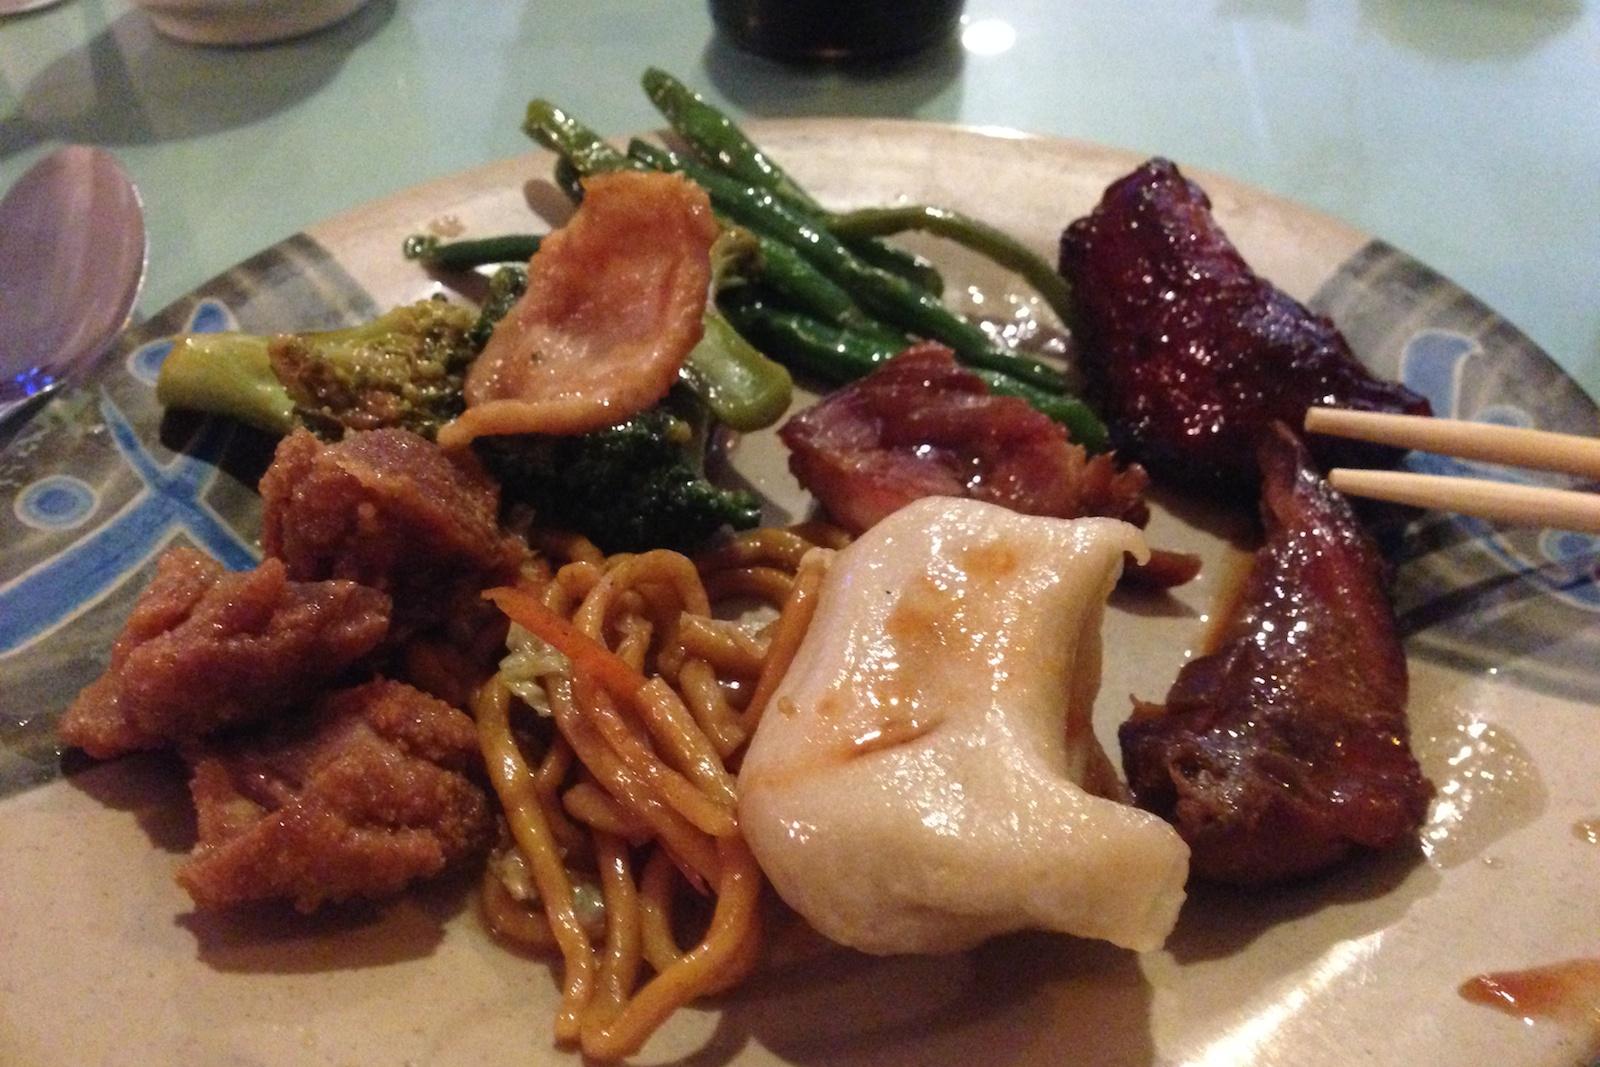 http://blog.rickk.com/food/2014/09/21/ate.2014.09.21.d1.jpg